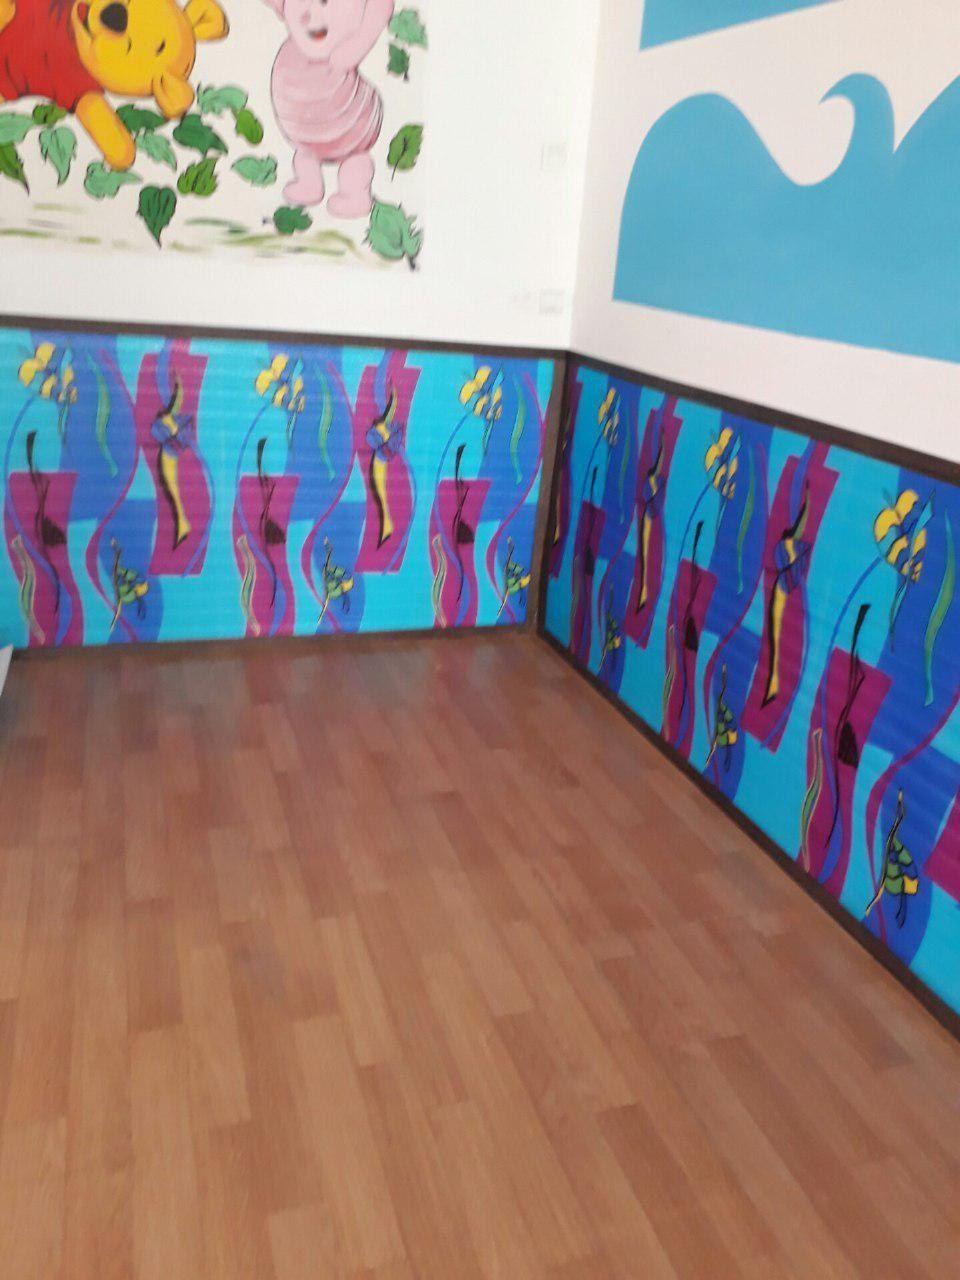 فوم دیوارپوش مهدکودک